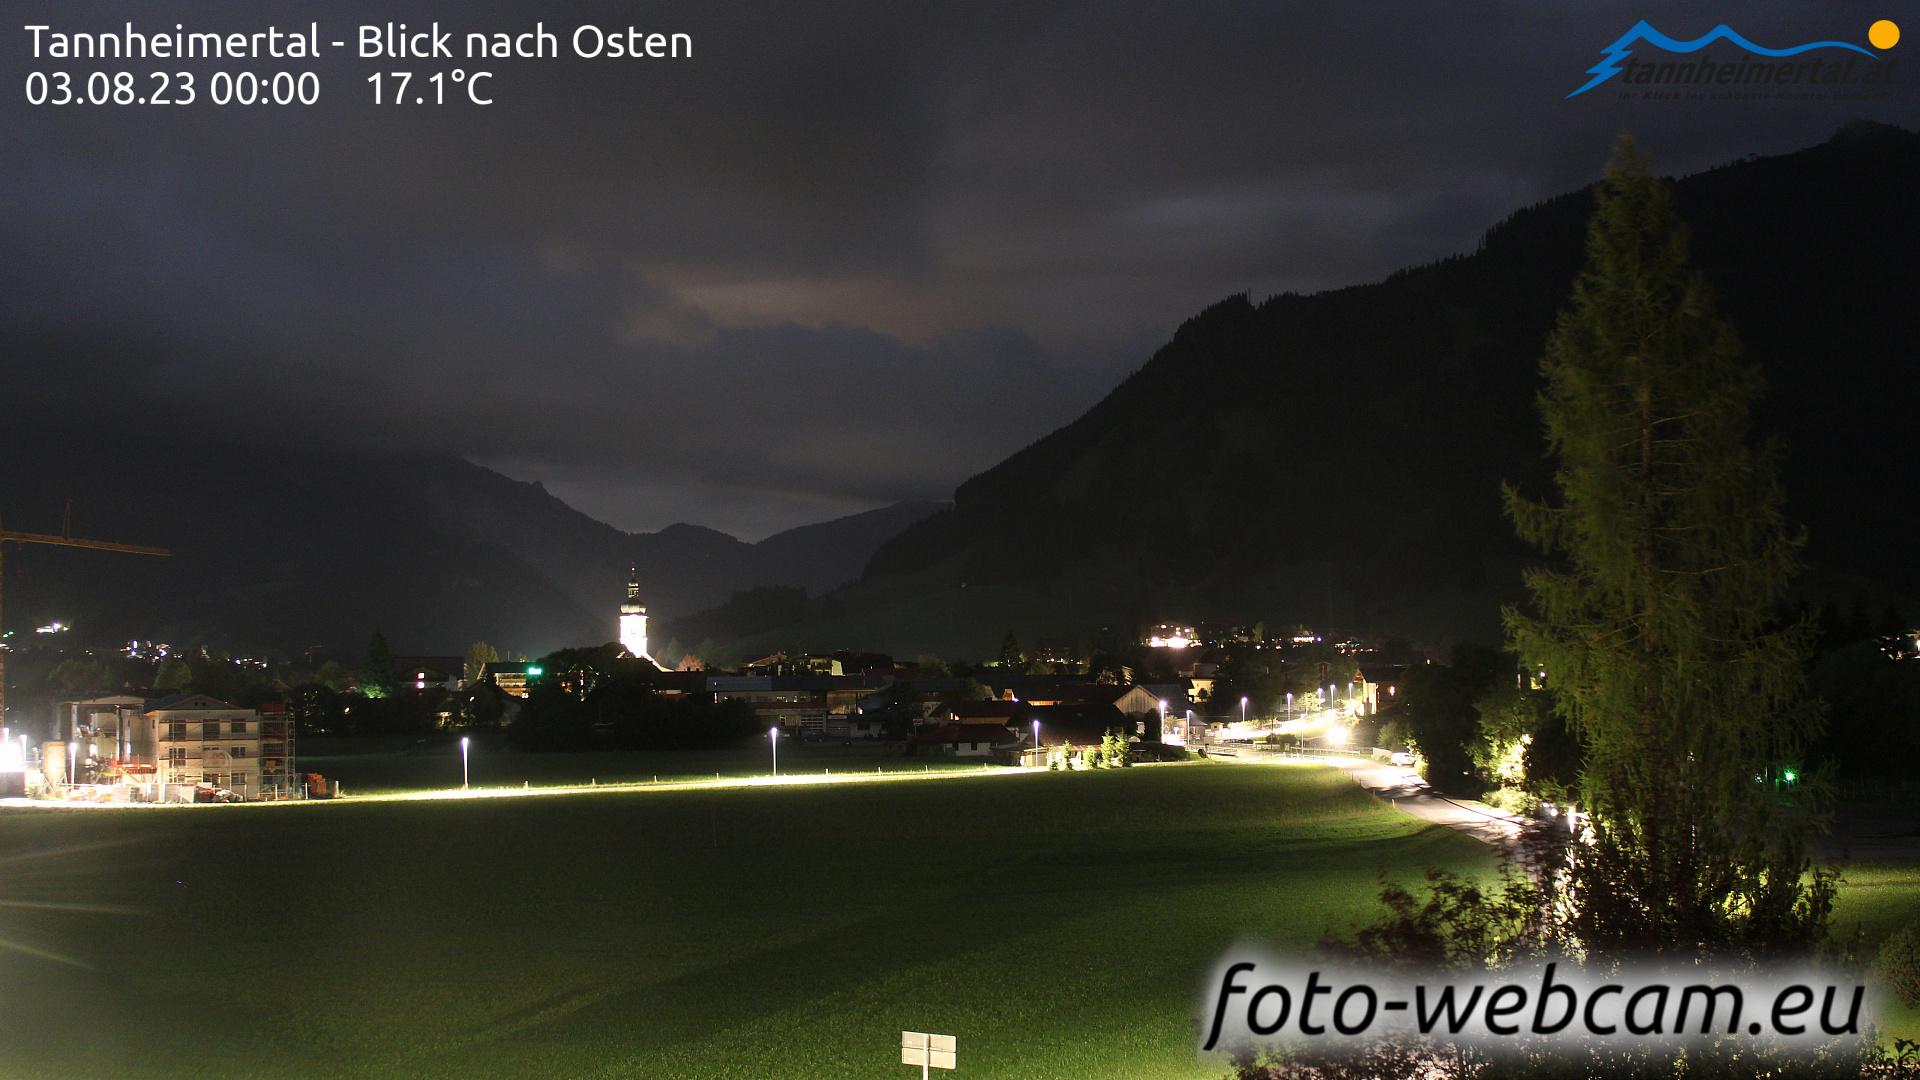 Tannheim Wed. 00:32